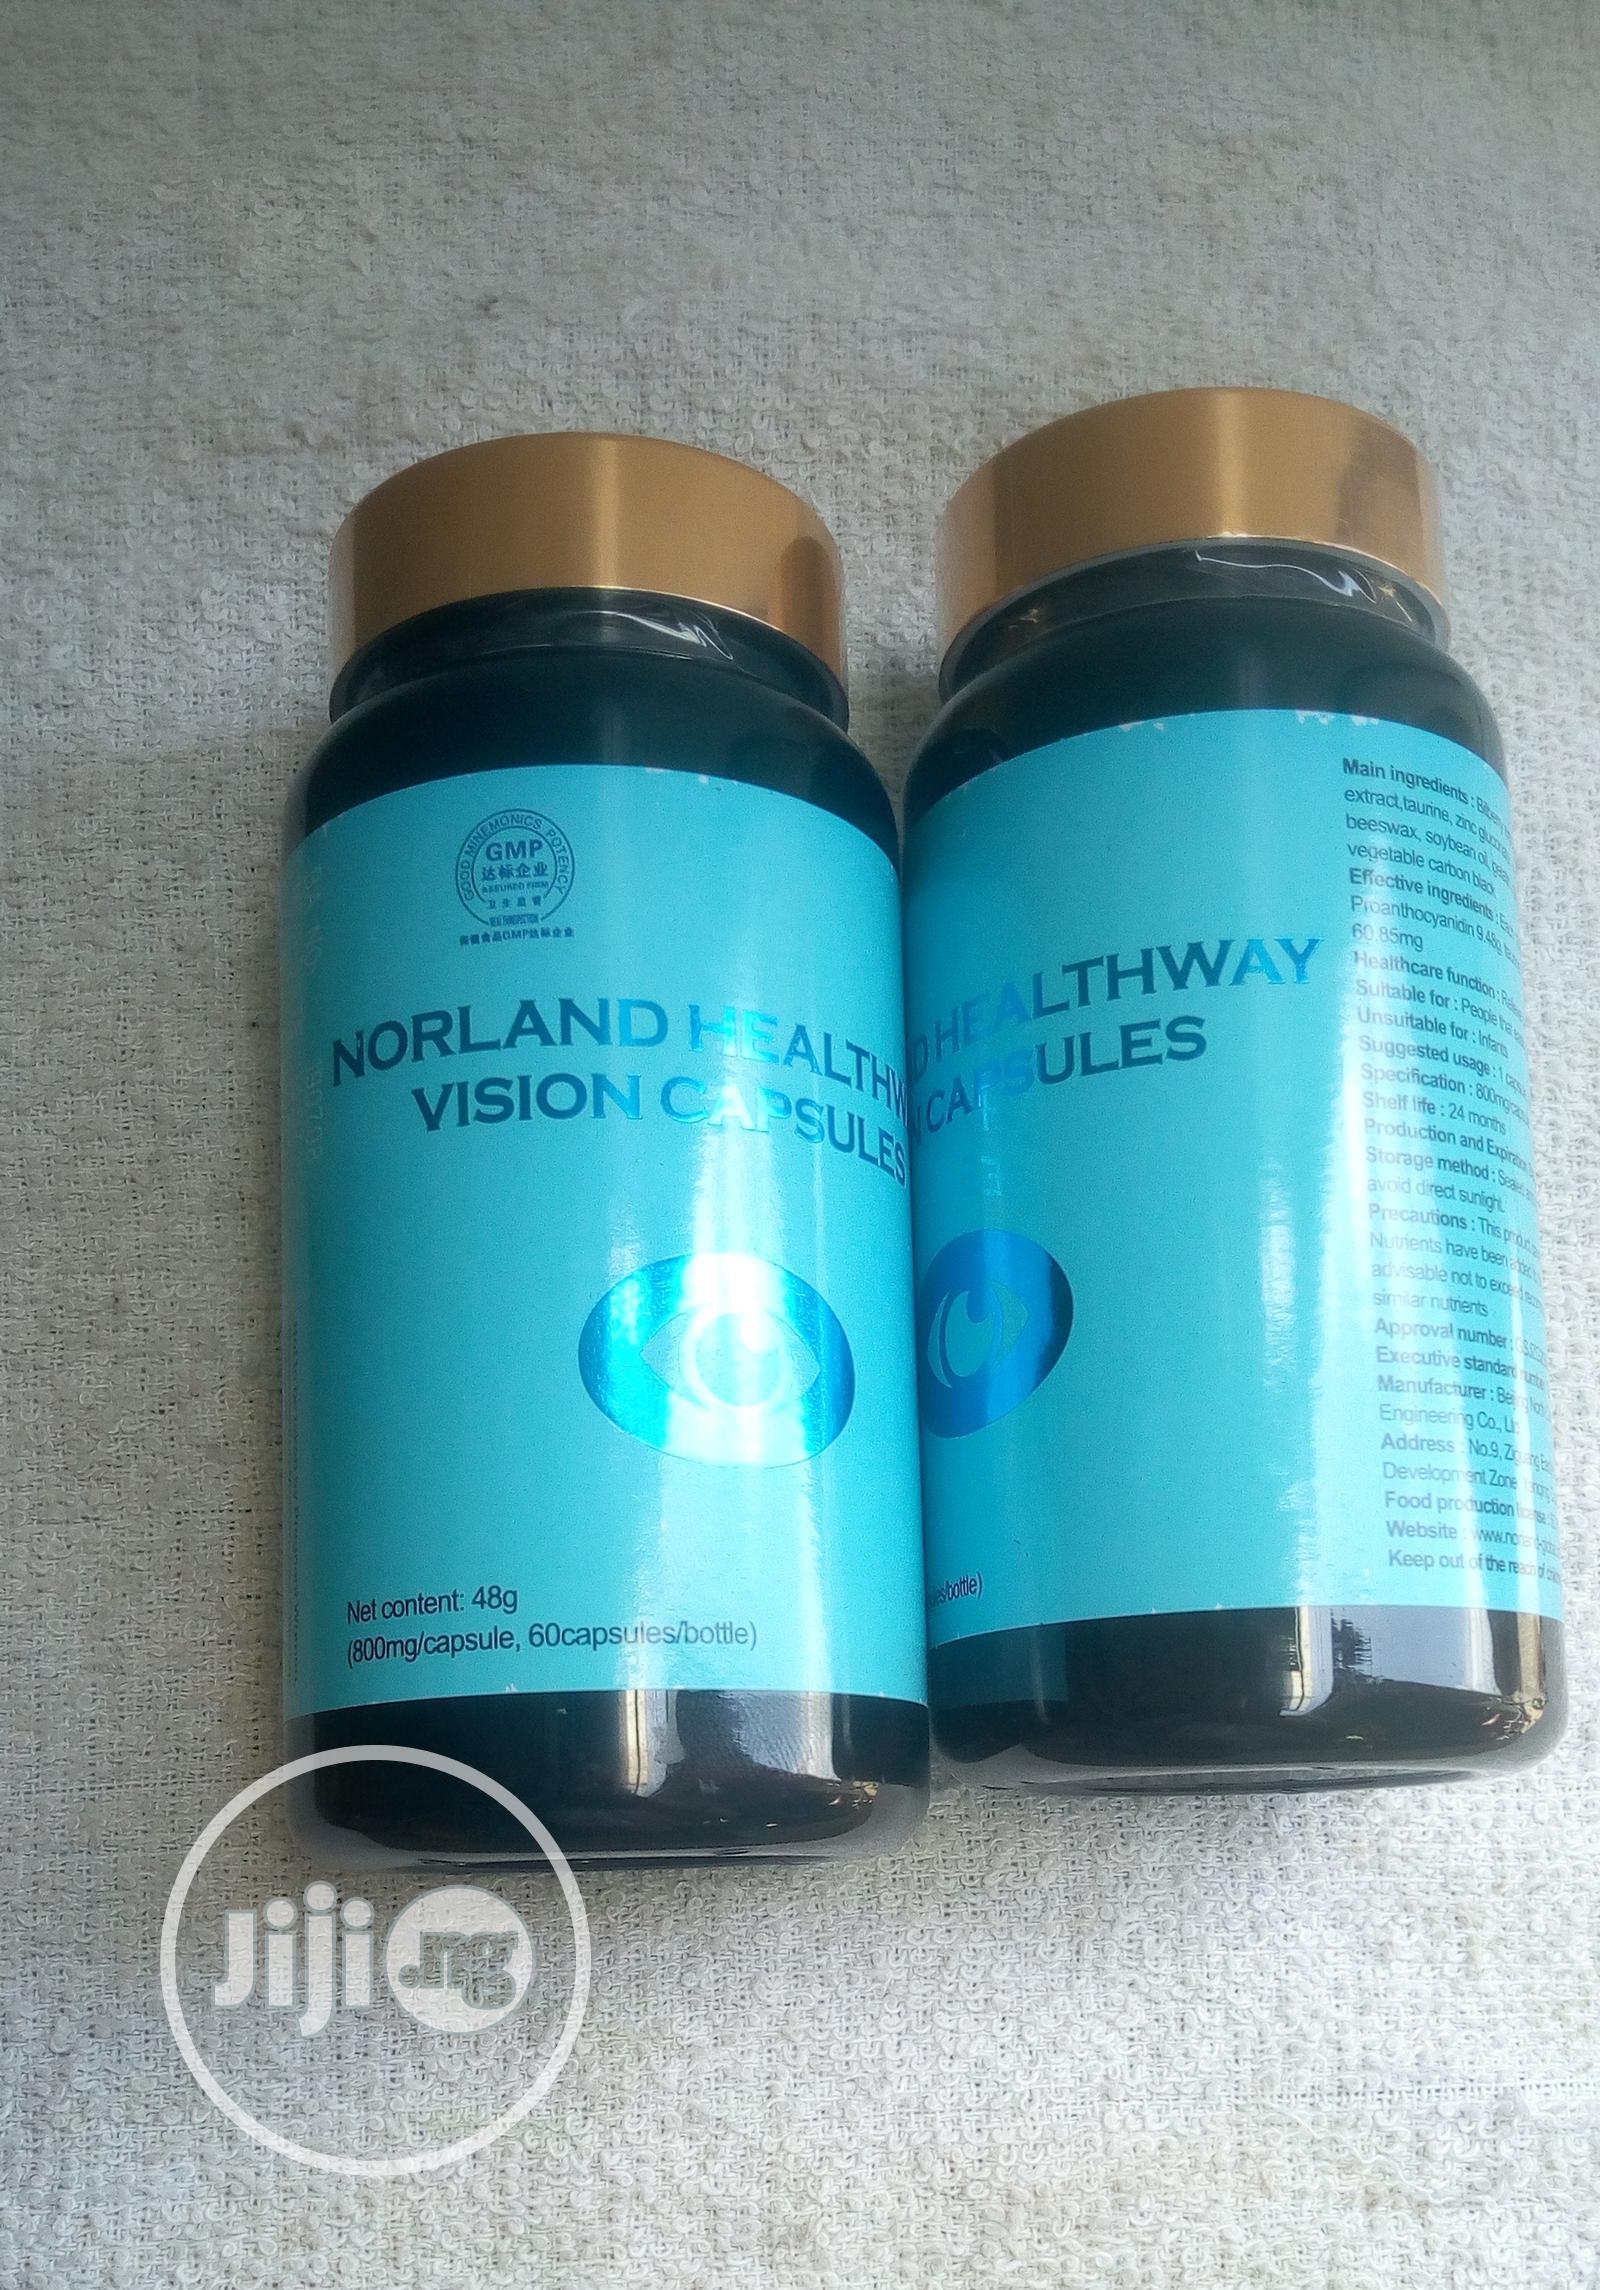 Vision Vitale Capsule. Norland Eye Capsule (Buy 2 Get 1 Free | Vitamins & Supplements for sale in Surulere, Lagos State, Nigeria